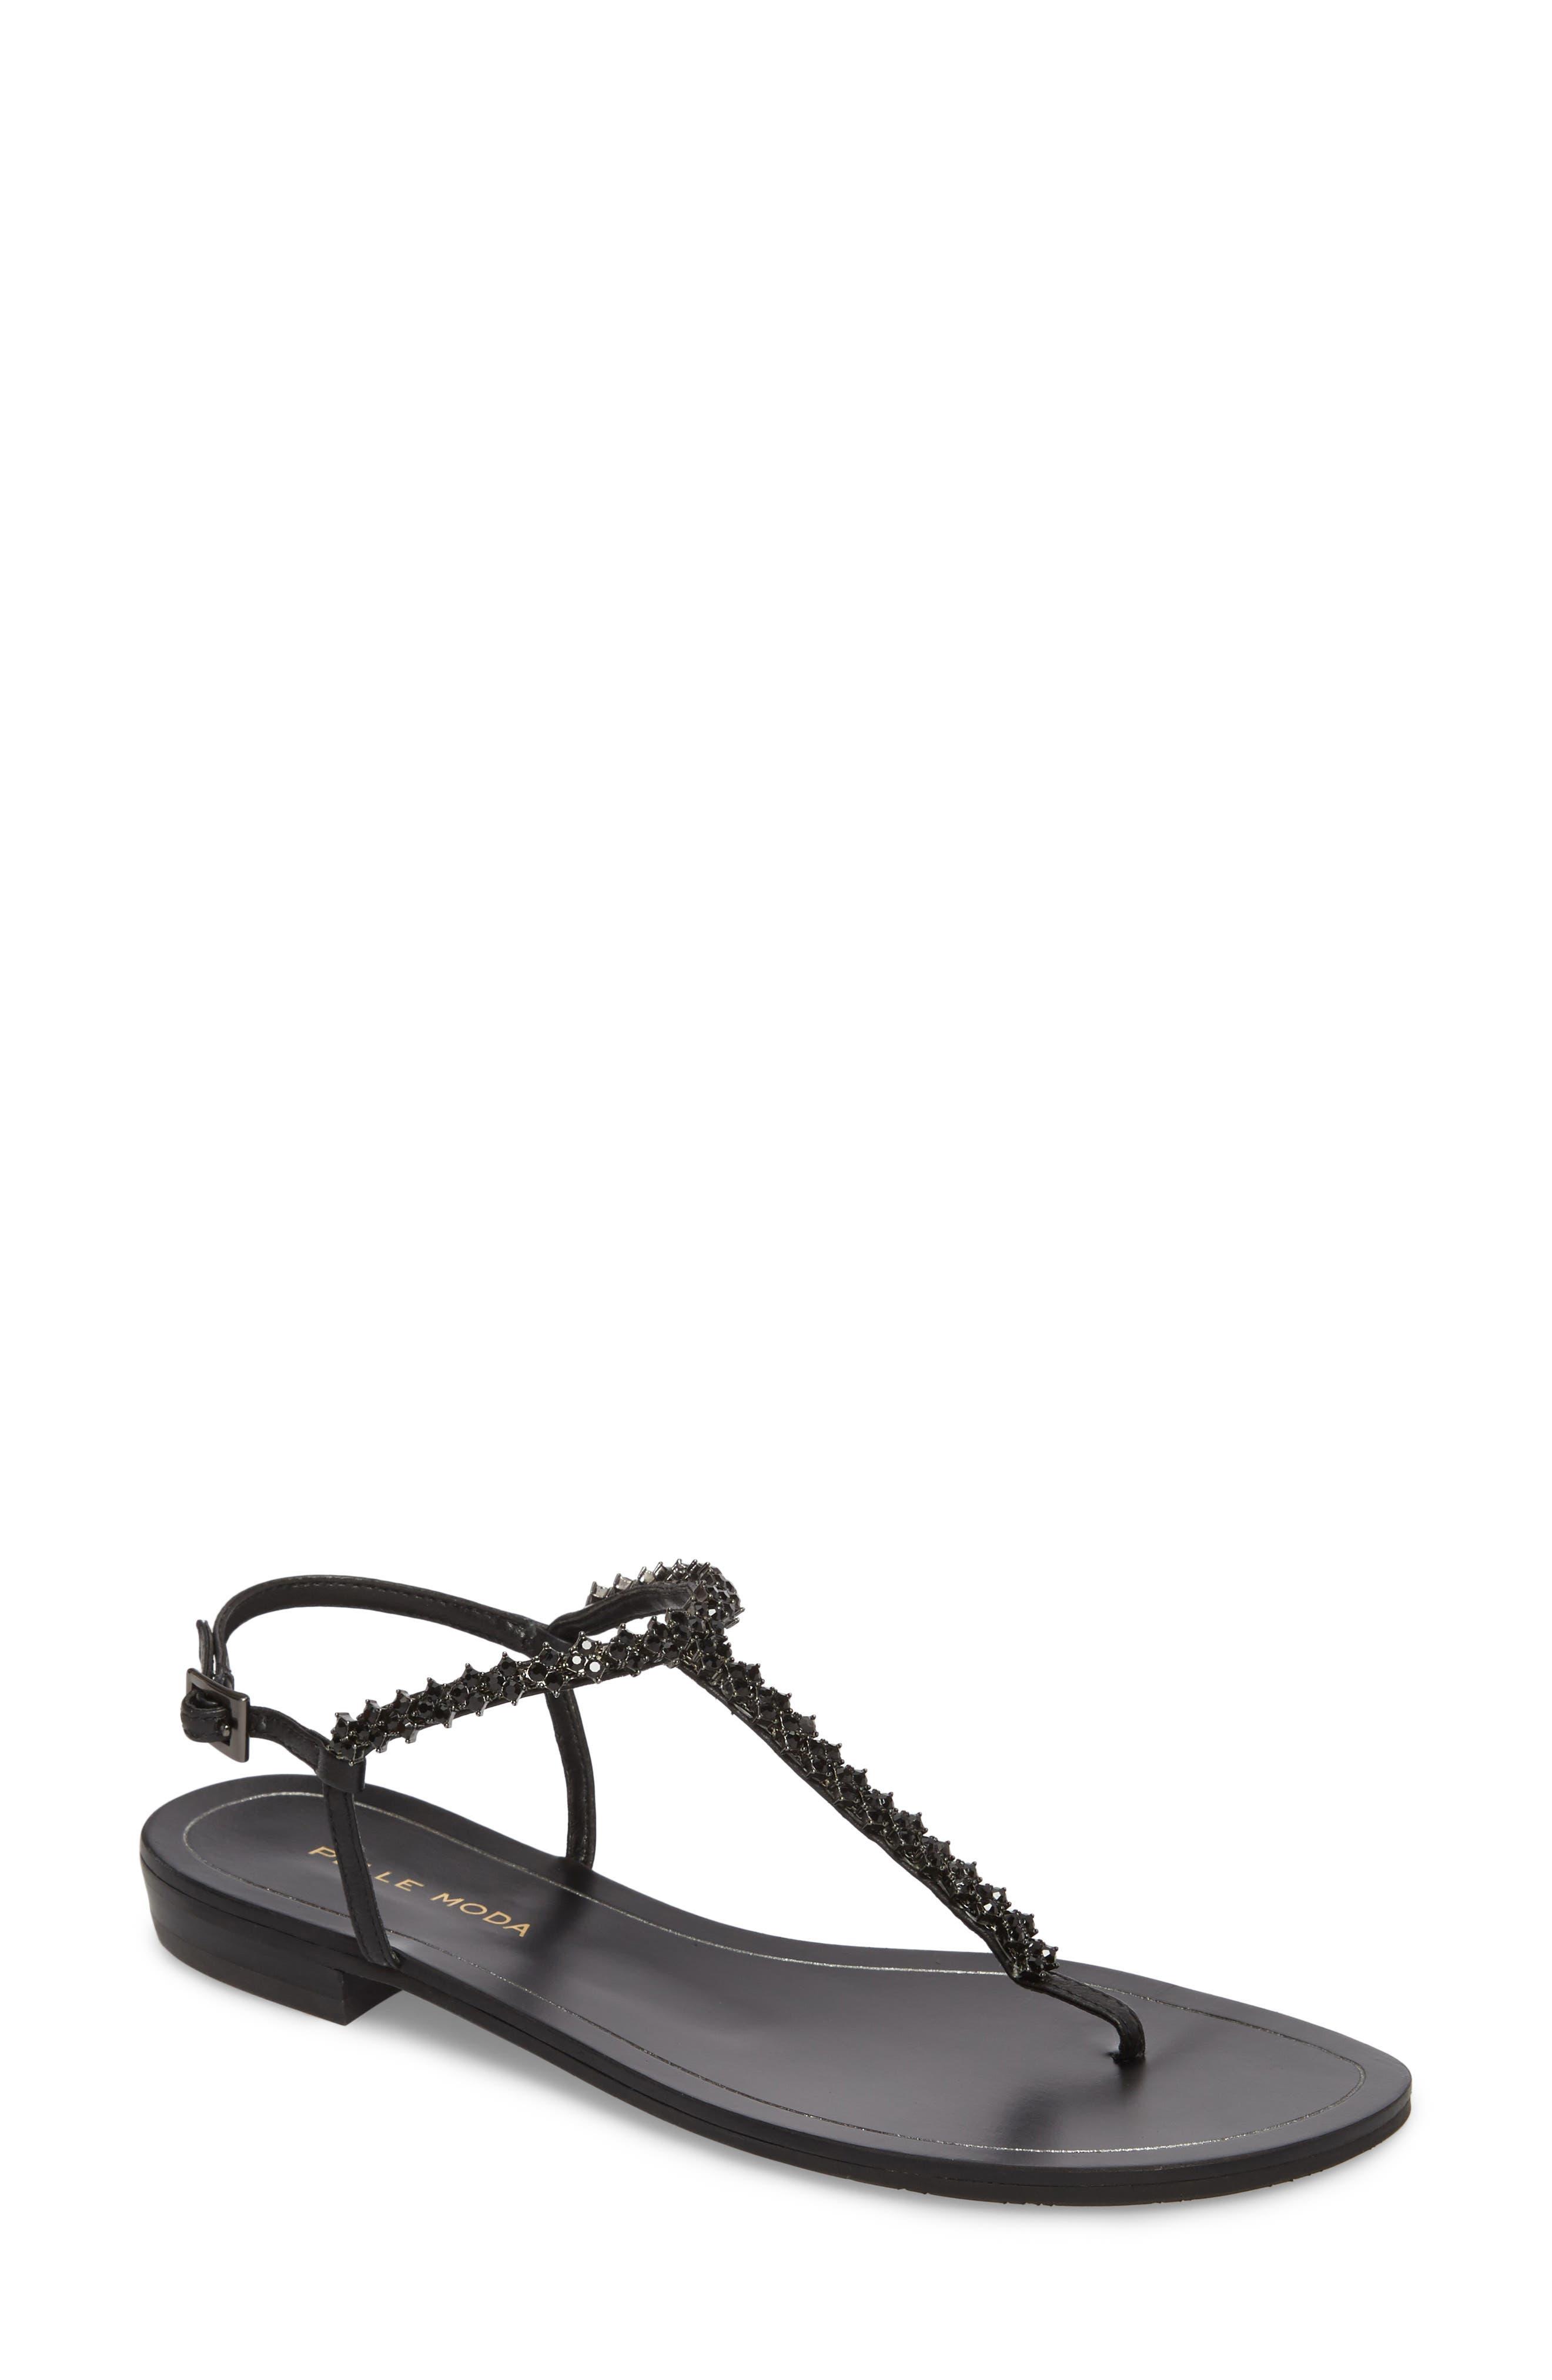 Baxley 4 Sandal, Main, color, 001